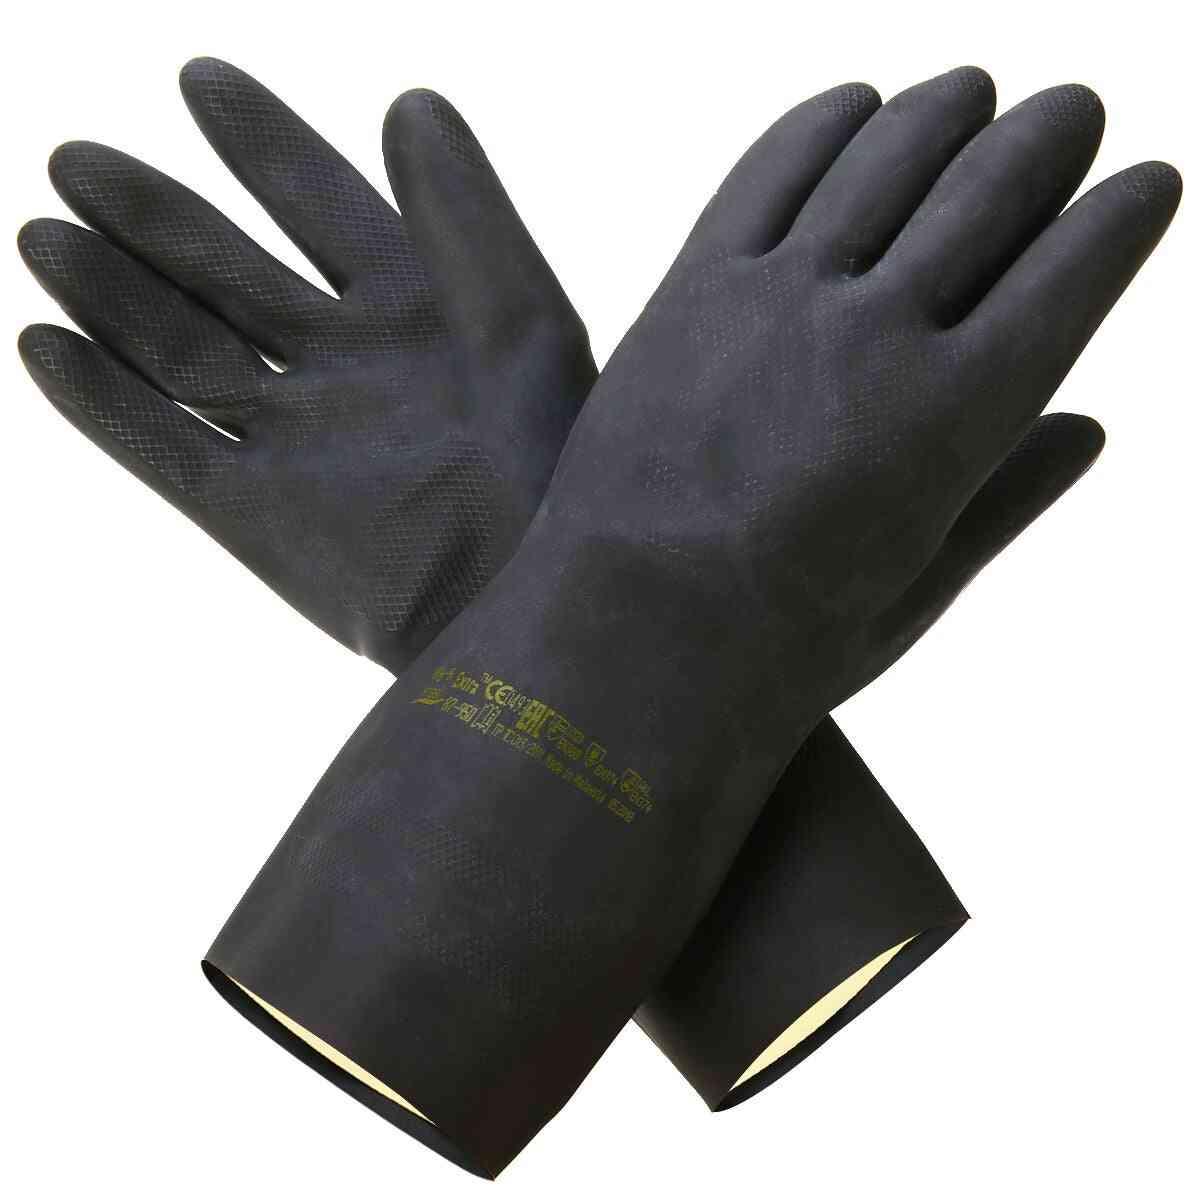 Mayitr Heavy Duty Natural Rubber Garden Gloves